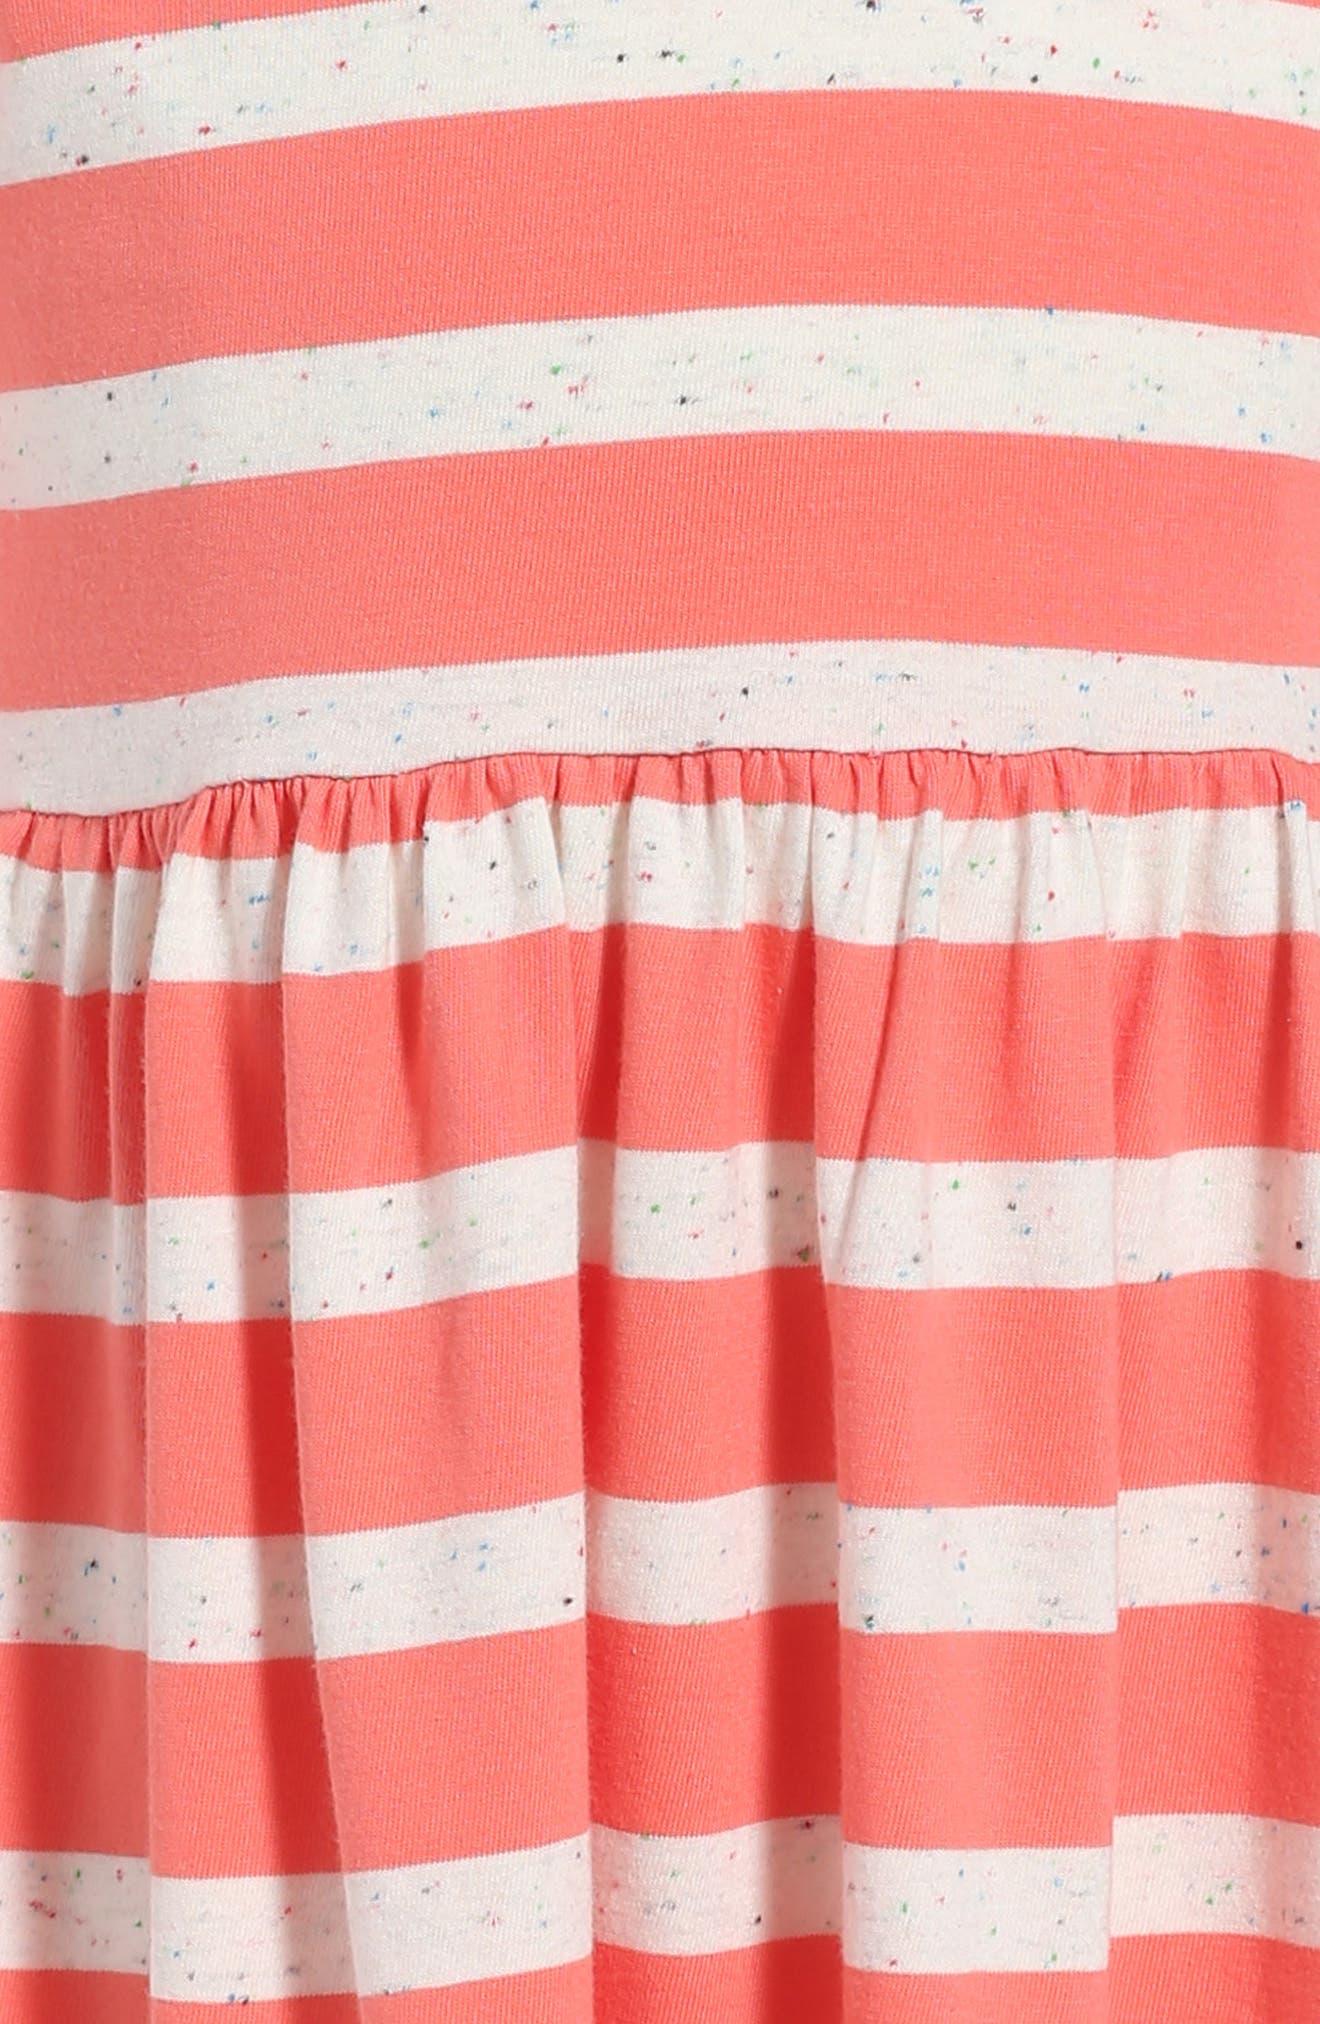 Saorsa Appliqué Dress,                             Alternate thumbnail 3, color,                             Orange Buoy